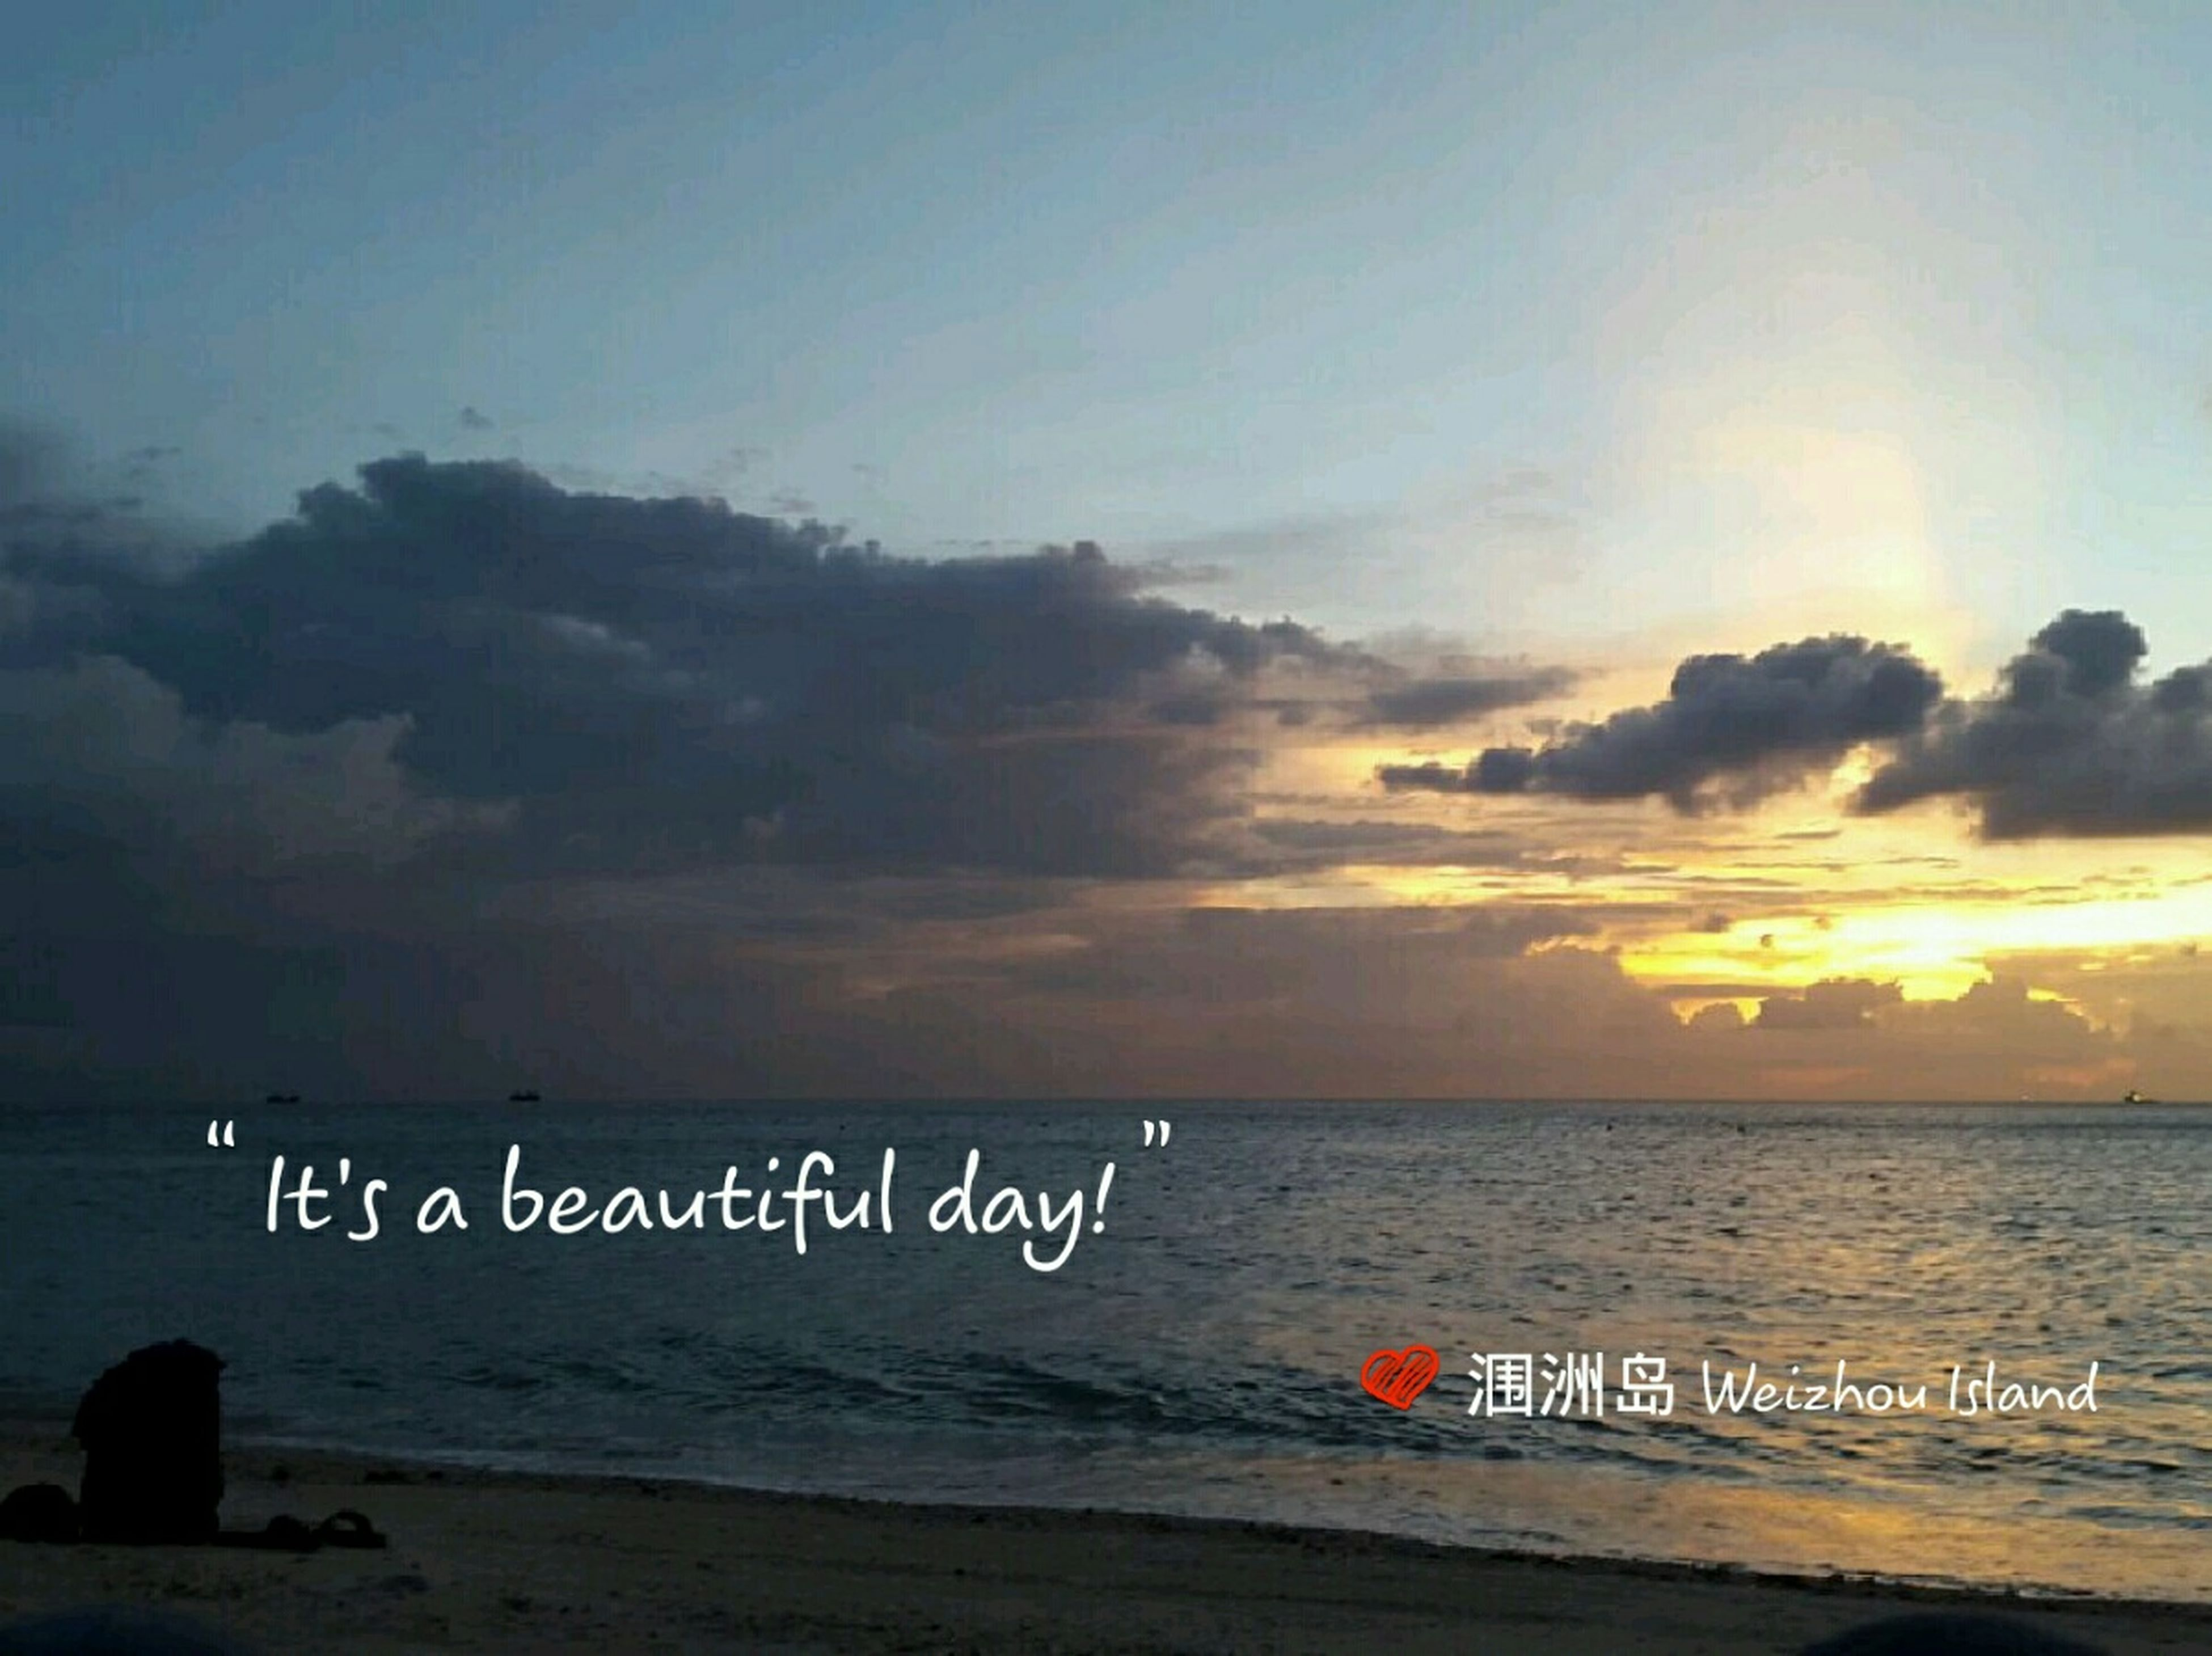 sea, water, sunset, beach, scenics, tranquil scene, sky, tranquility, horizon over water, beauty in nature, shore, nature, idyllic, pier, dusk, cloud - sky, orange color, outdoors, non-urban scene, sand